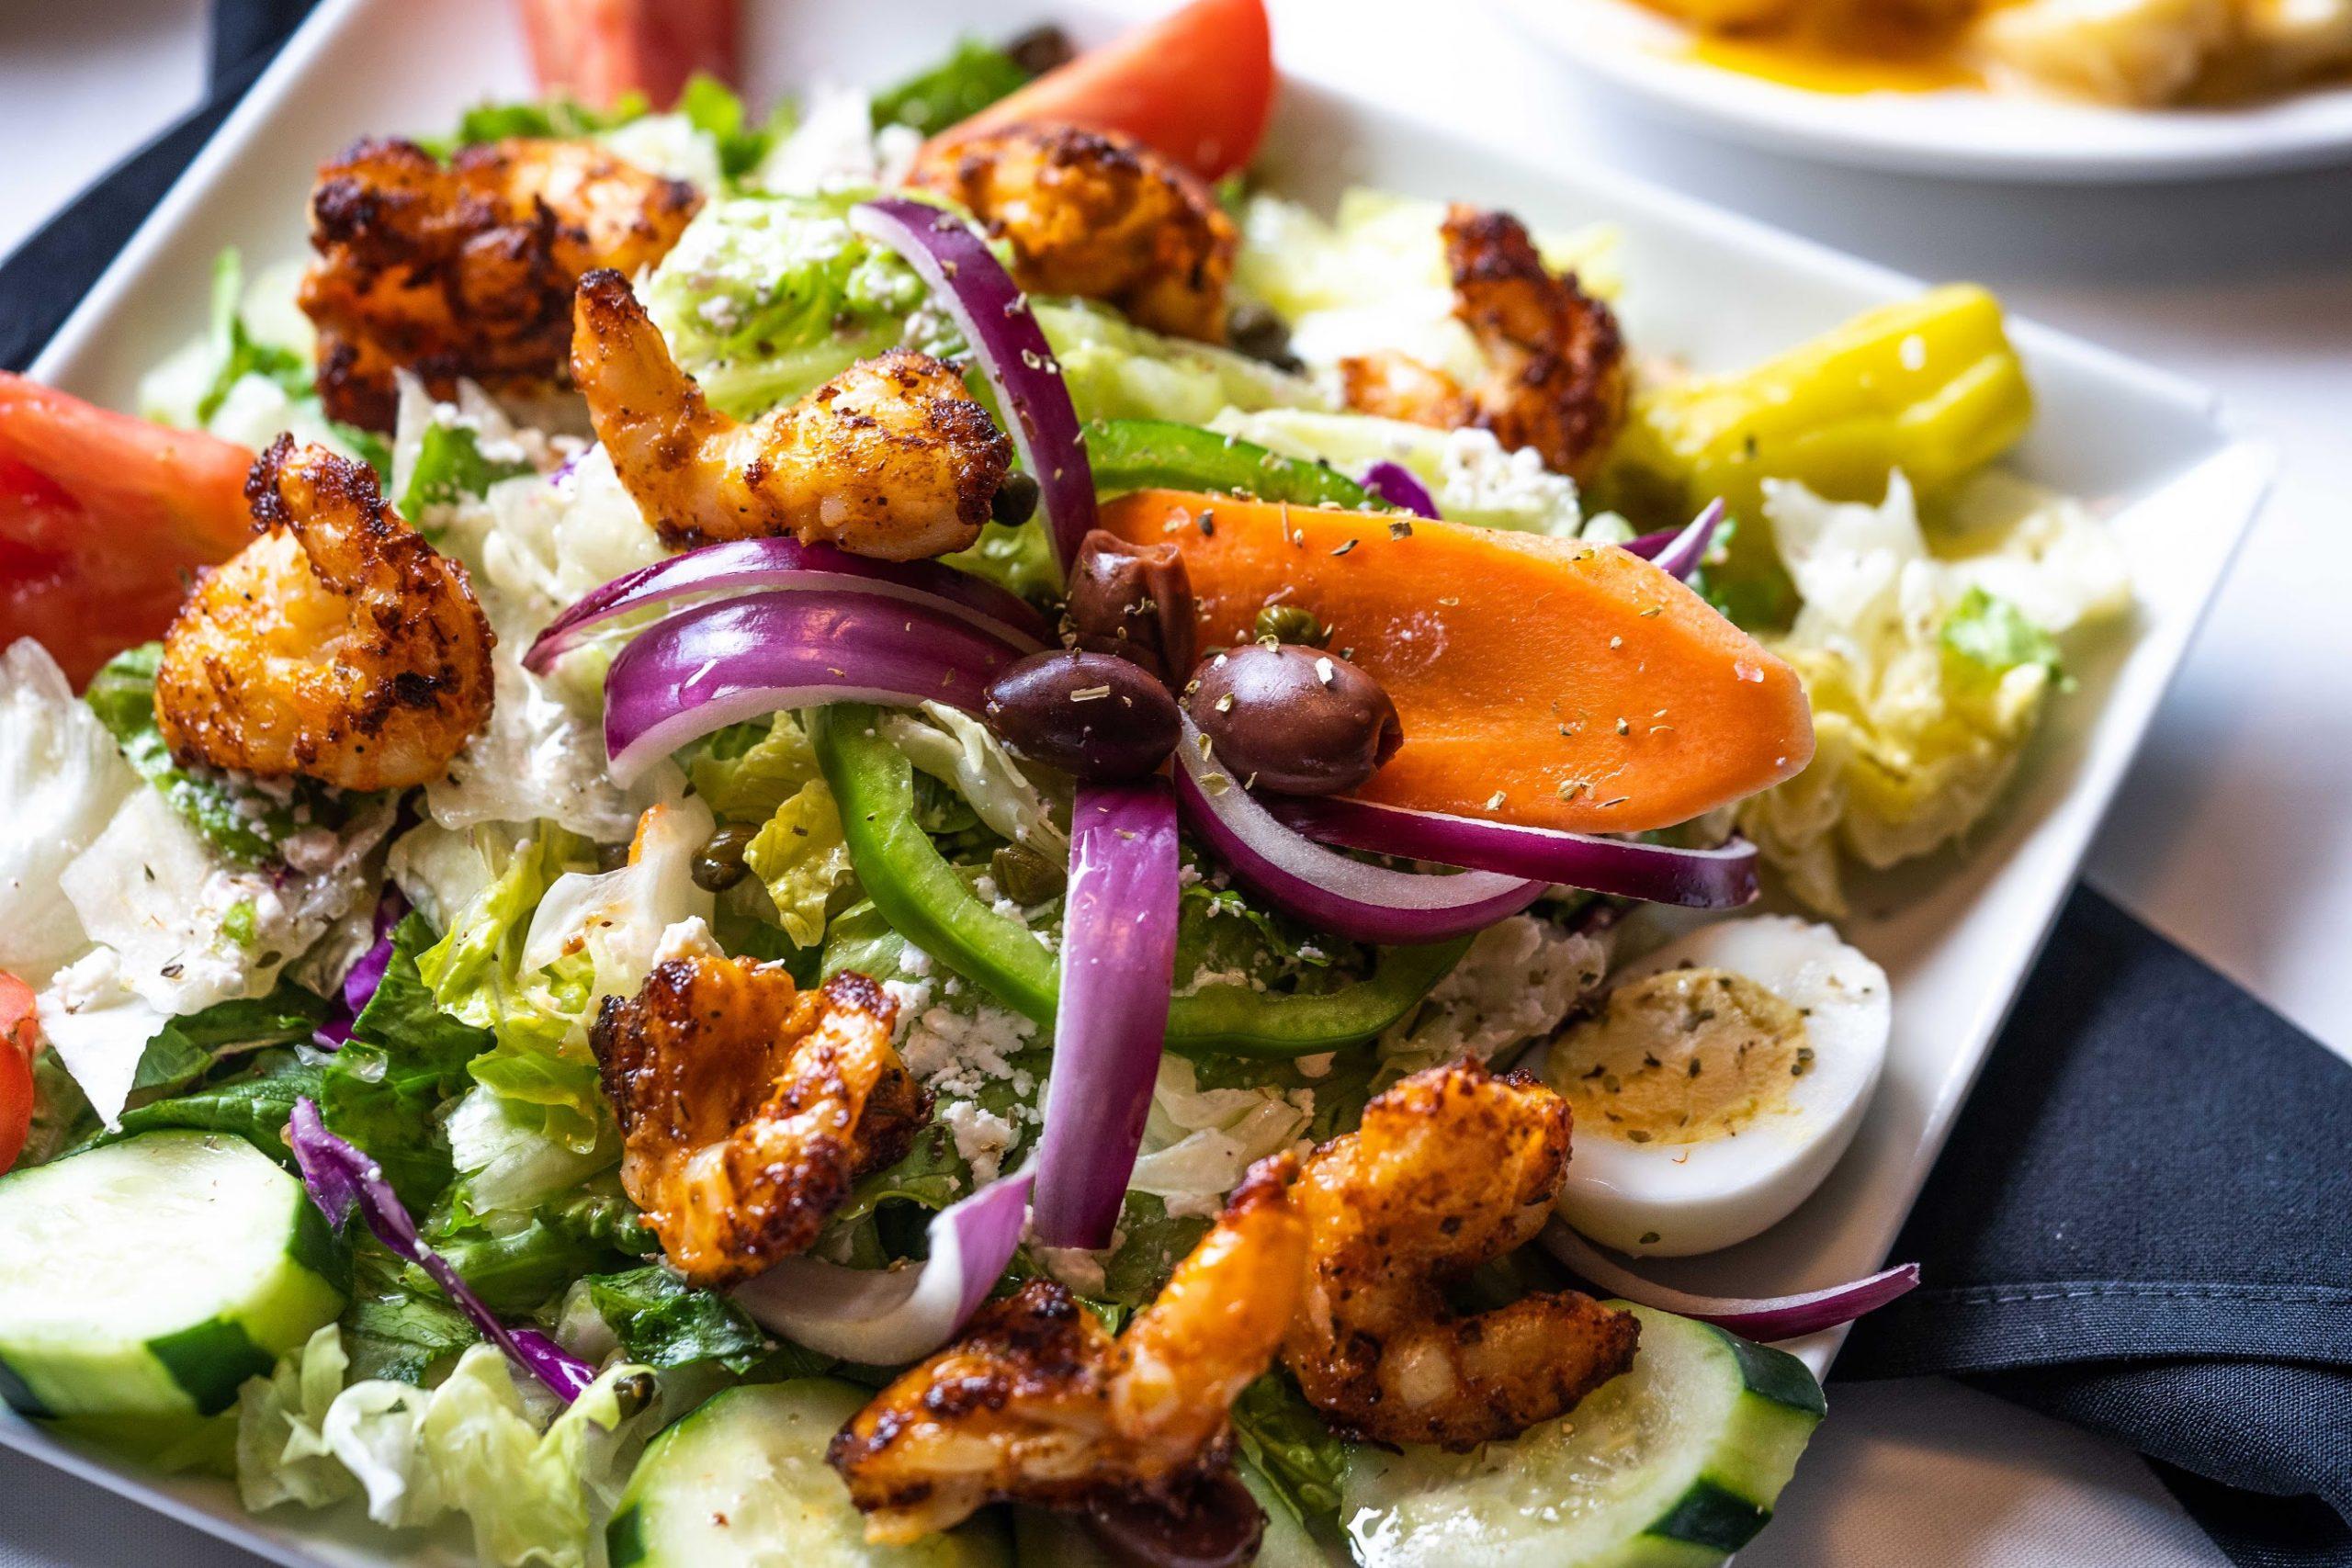 The Blackened Shrimp Salad at Christie's Seafood & Steaks